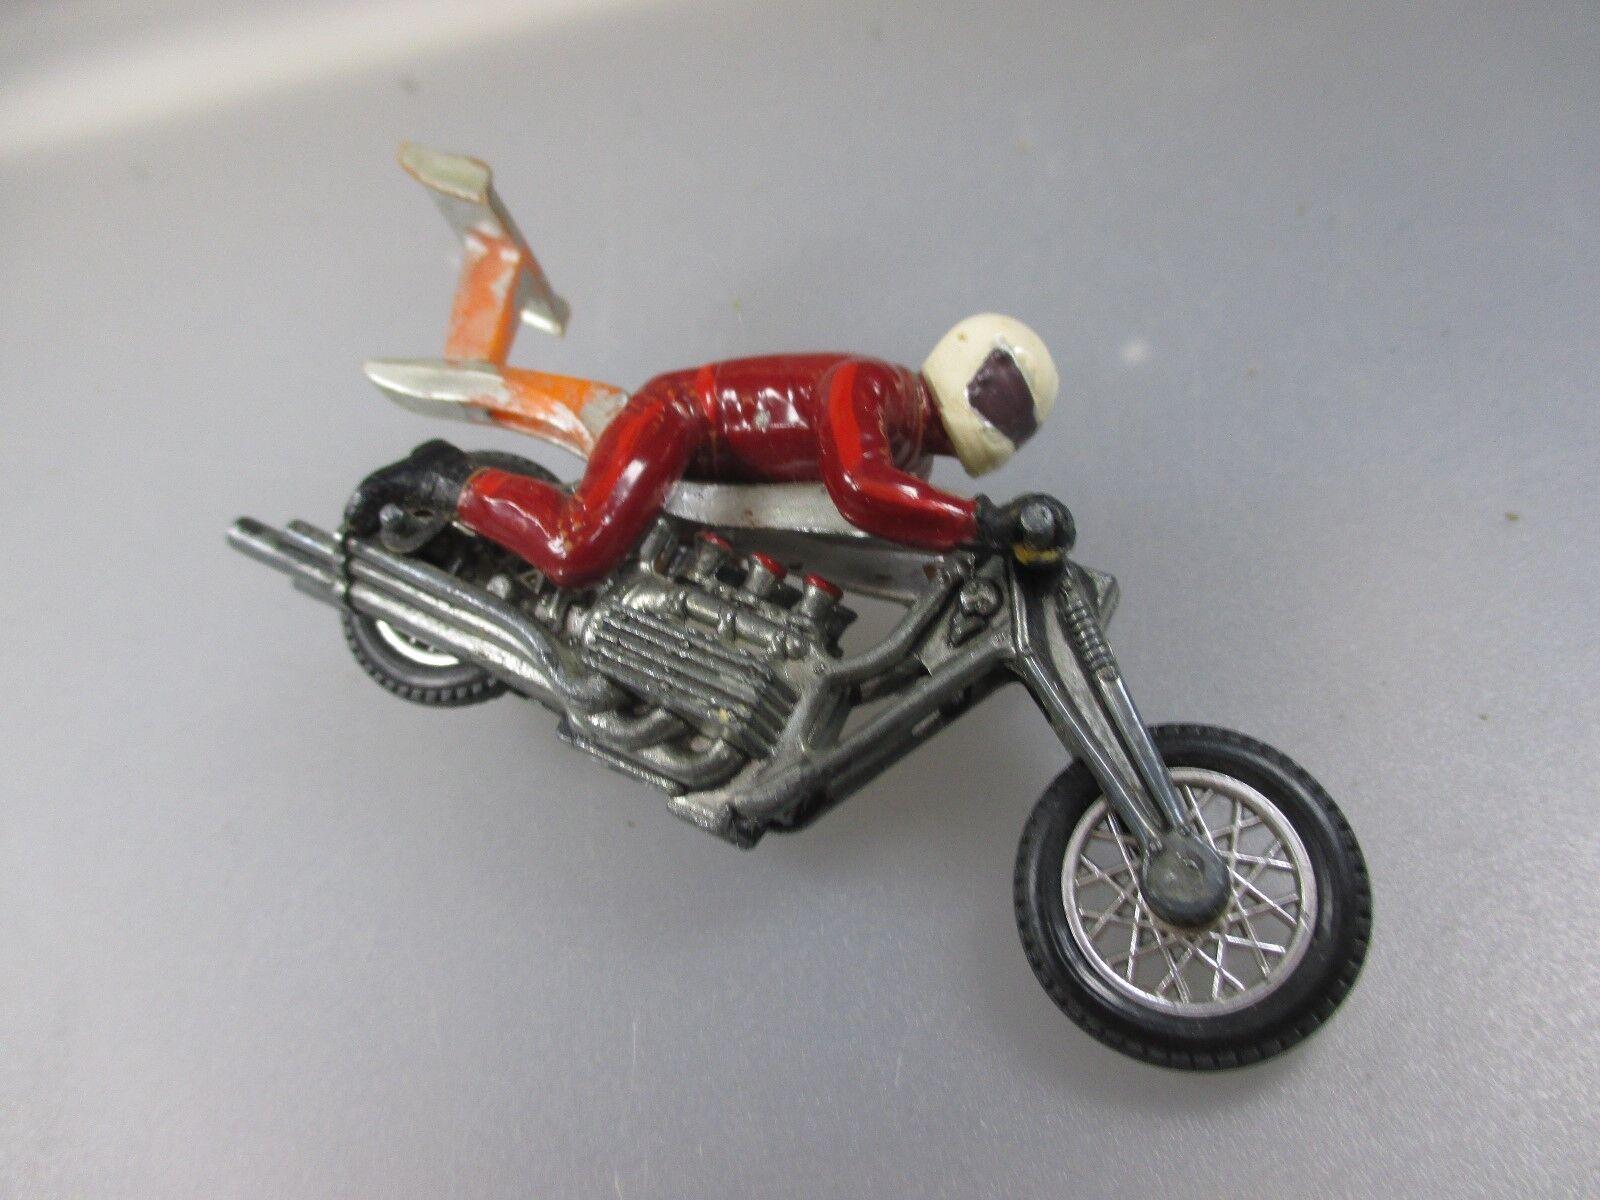 MATTEL rrrumblers Hong Kong MOTO/Schopper/Motorcycle/Motorbike, RAR legno  8